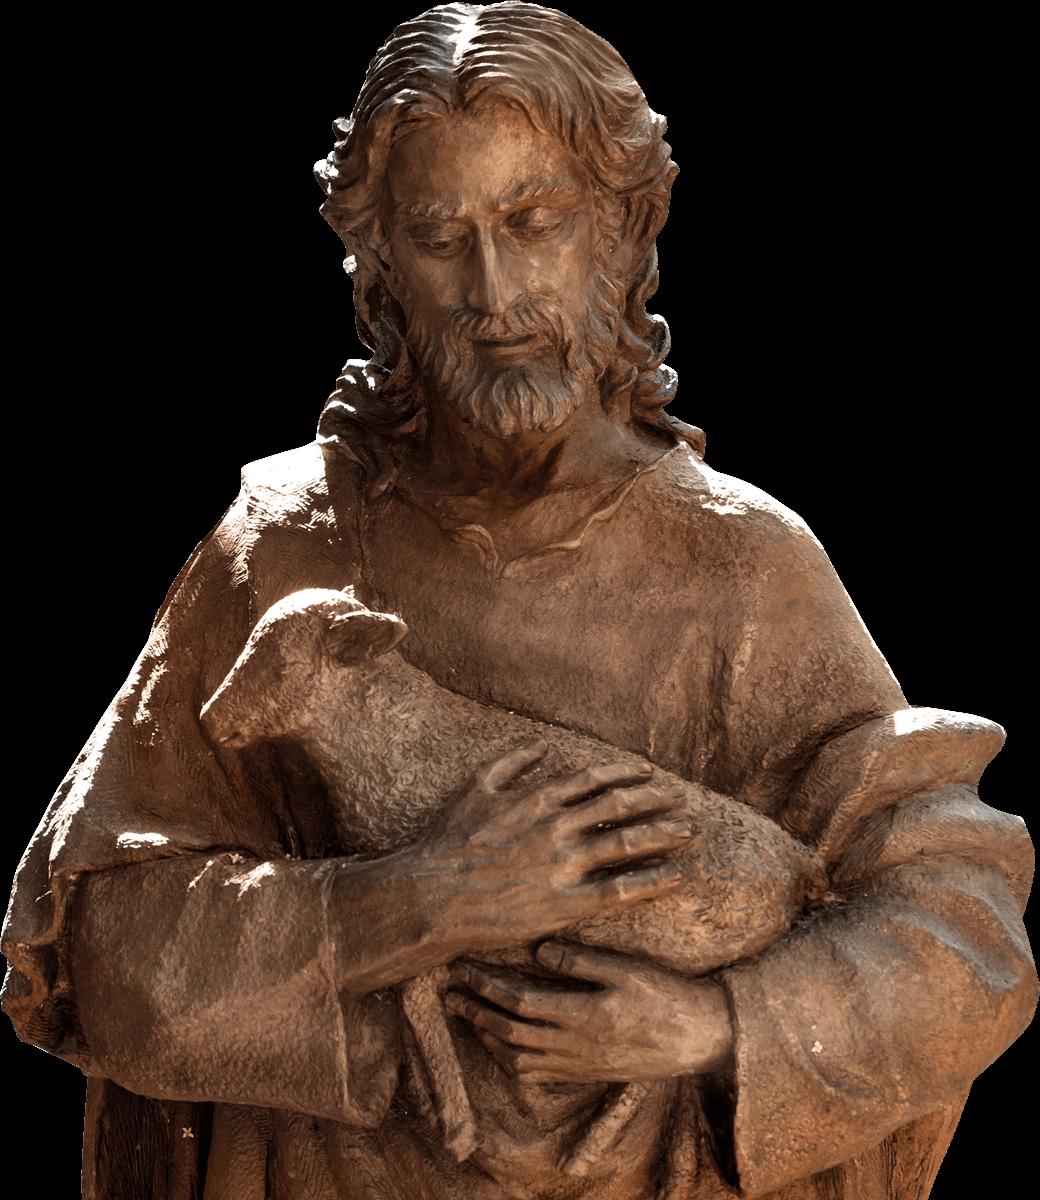 jesus-christ-good-shepherd-religion-161289-2.png